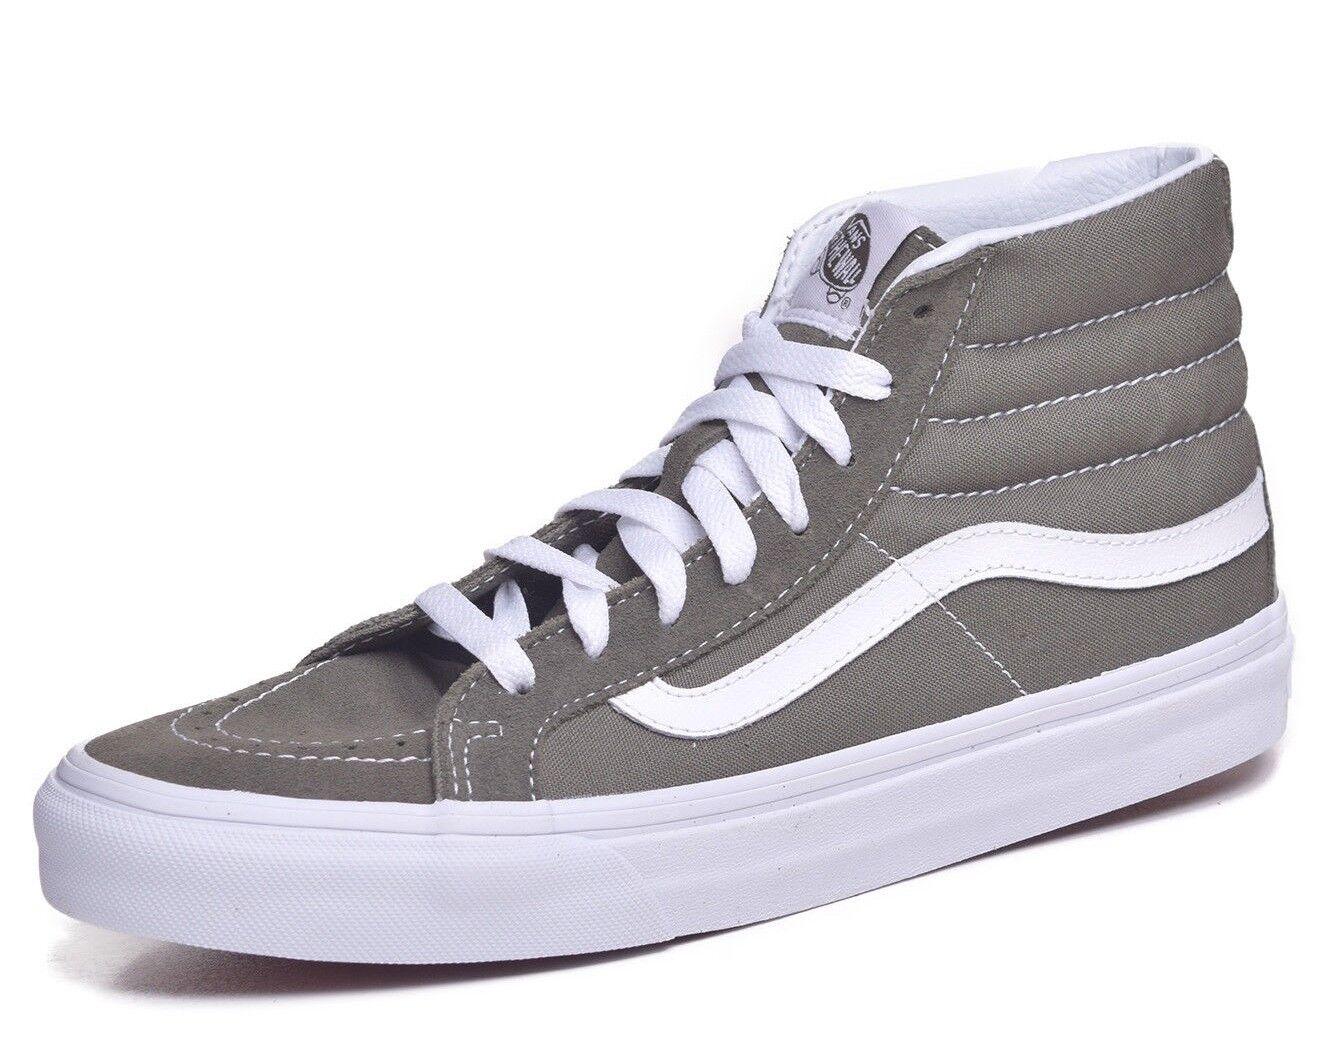 e4ee2146d3 Vans Sk8 Hi Slim Skateboard Shoes Women Men Choose Colors   Sizes